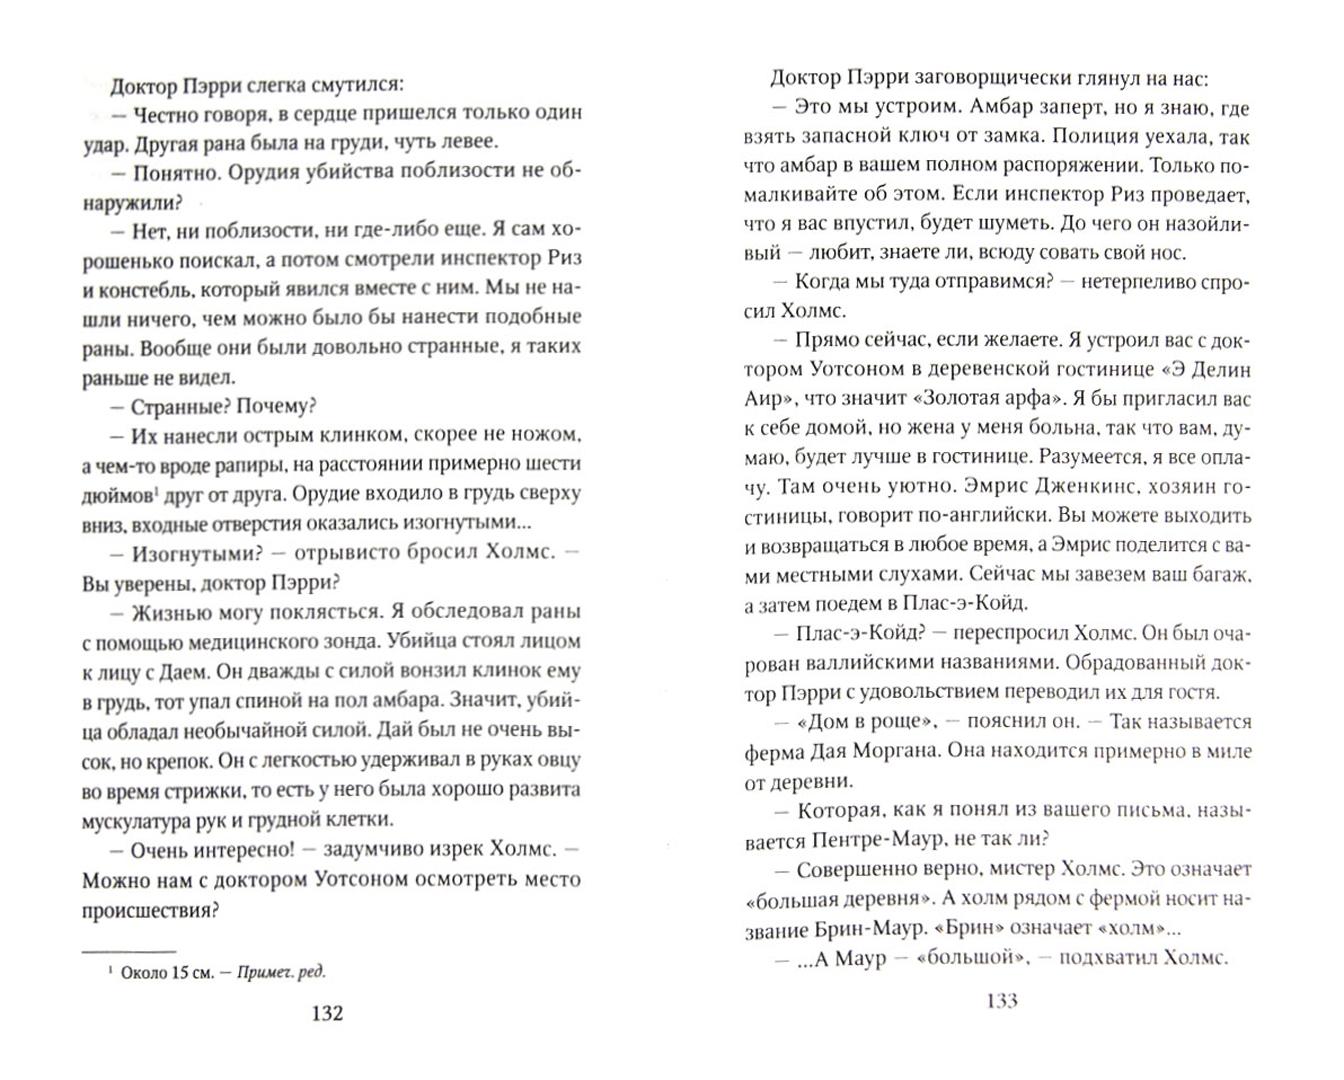 Иллюстрация 1 из 5 для Тетради Шерлока Холмса - Джун Томсон | Лабиринт - книги. Источник: Лабиринт